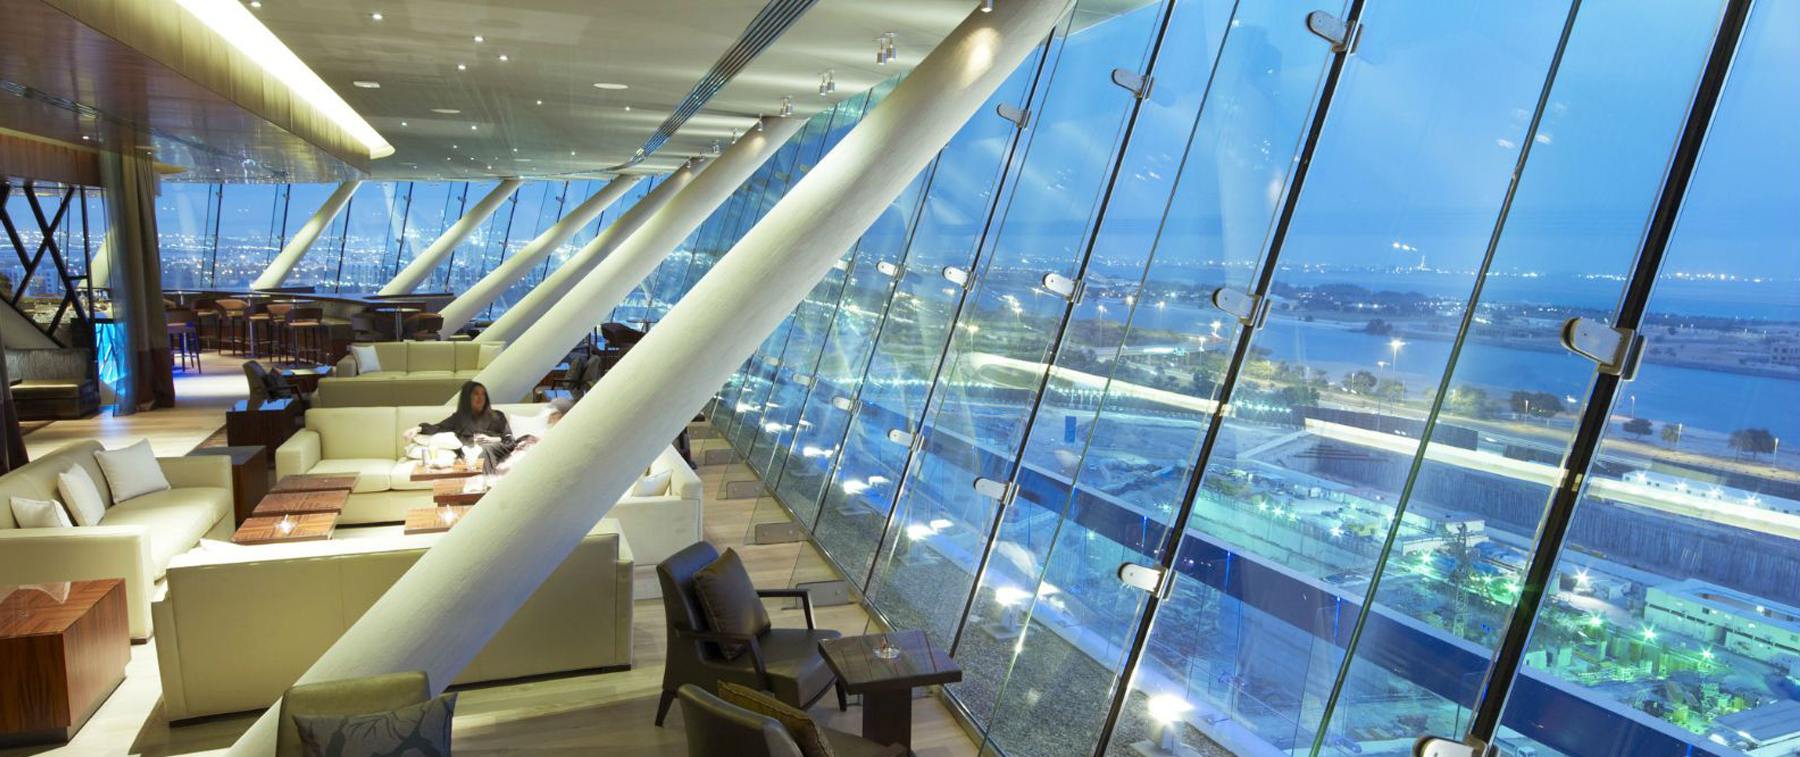 Terrace restaurant in Abu Dhabi - Relax@12